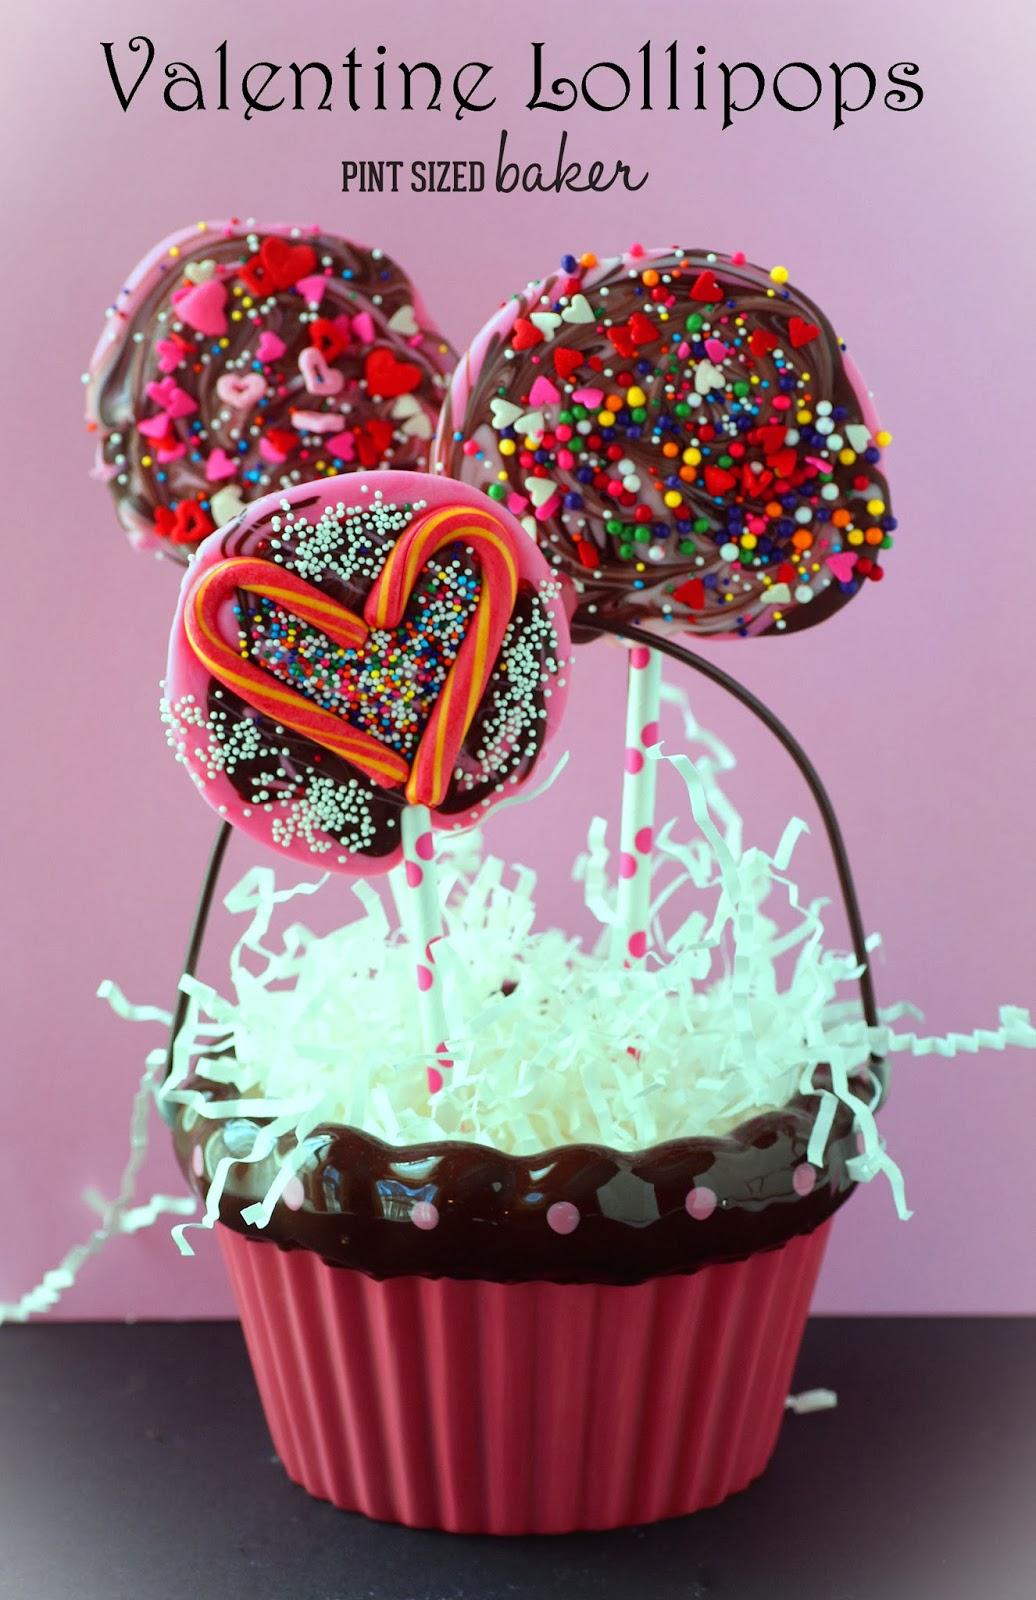 kids valentines lollipops - Valentine Lollipops